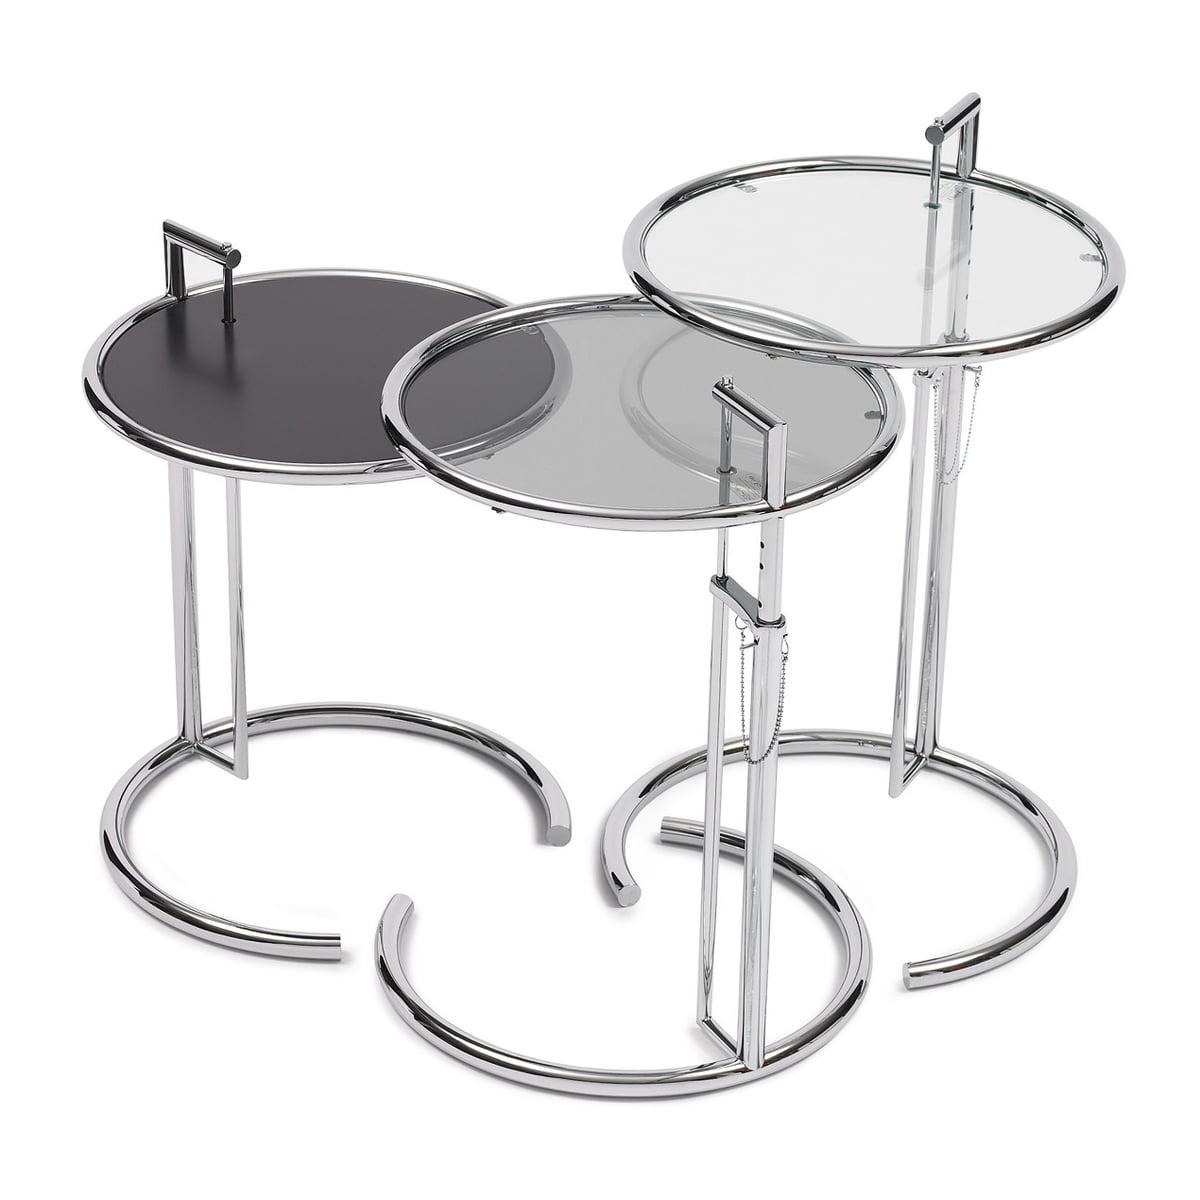 classicon adjustable table e 102 mit unterschiedlichen oberflachen